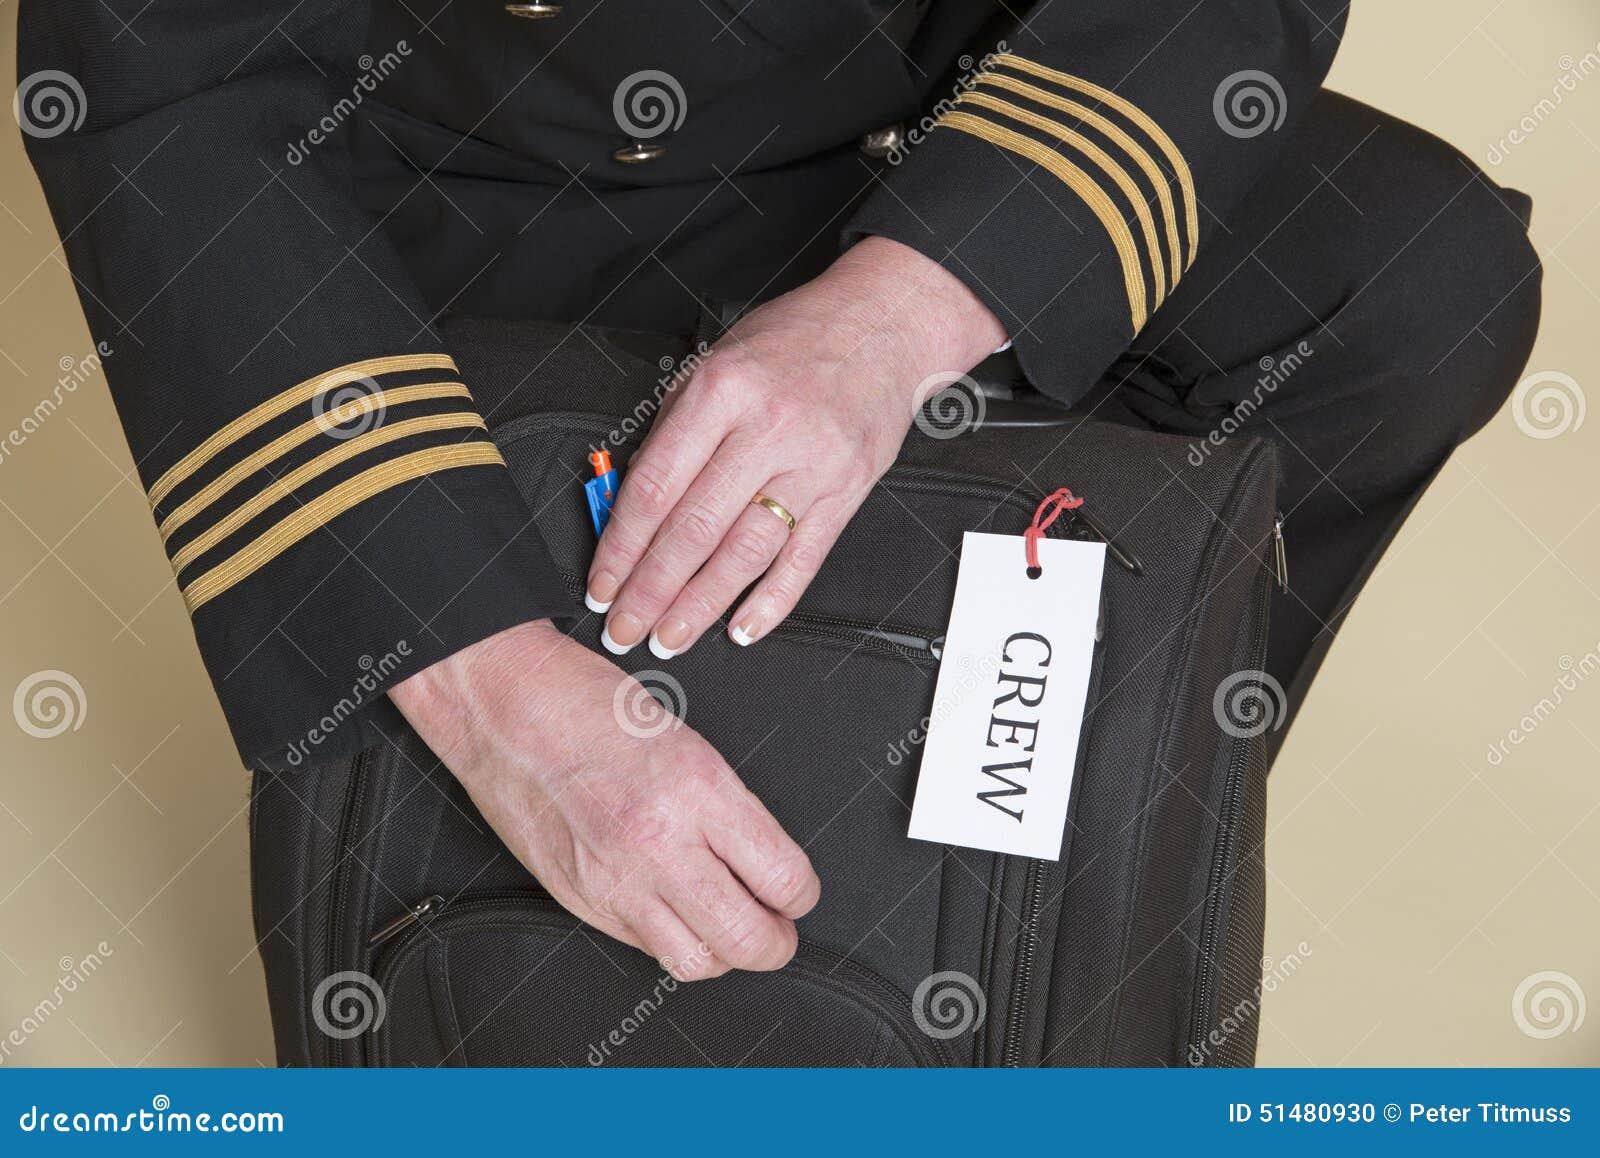 bc3b65a1 Проверка сумки полета экипажа самолета Стоковое Фото - изображение ...